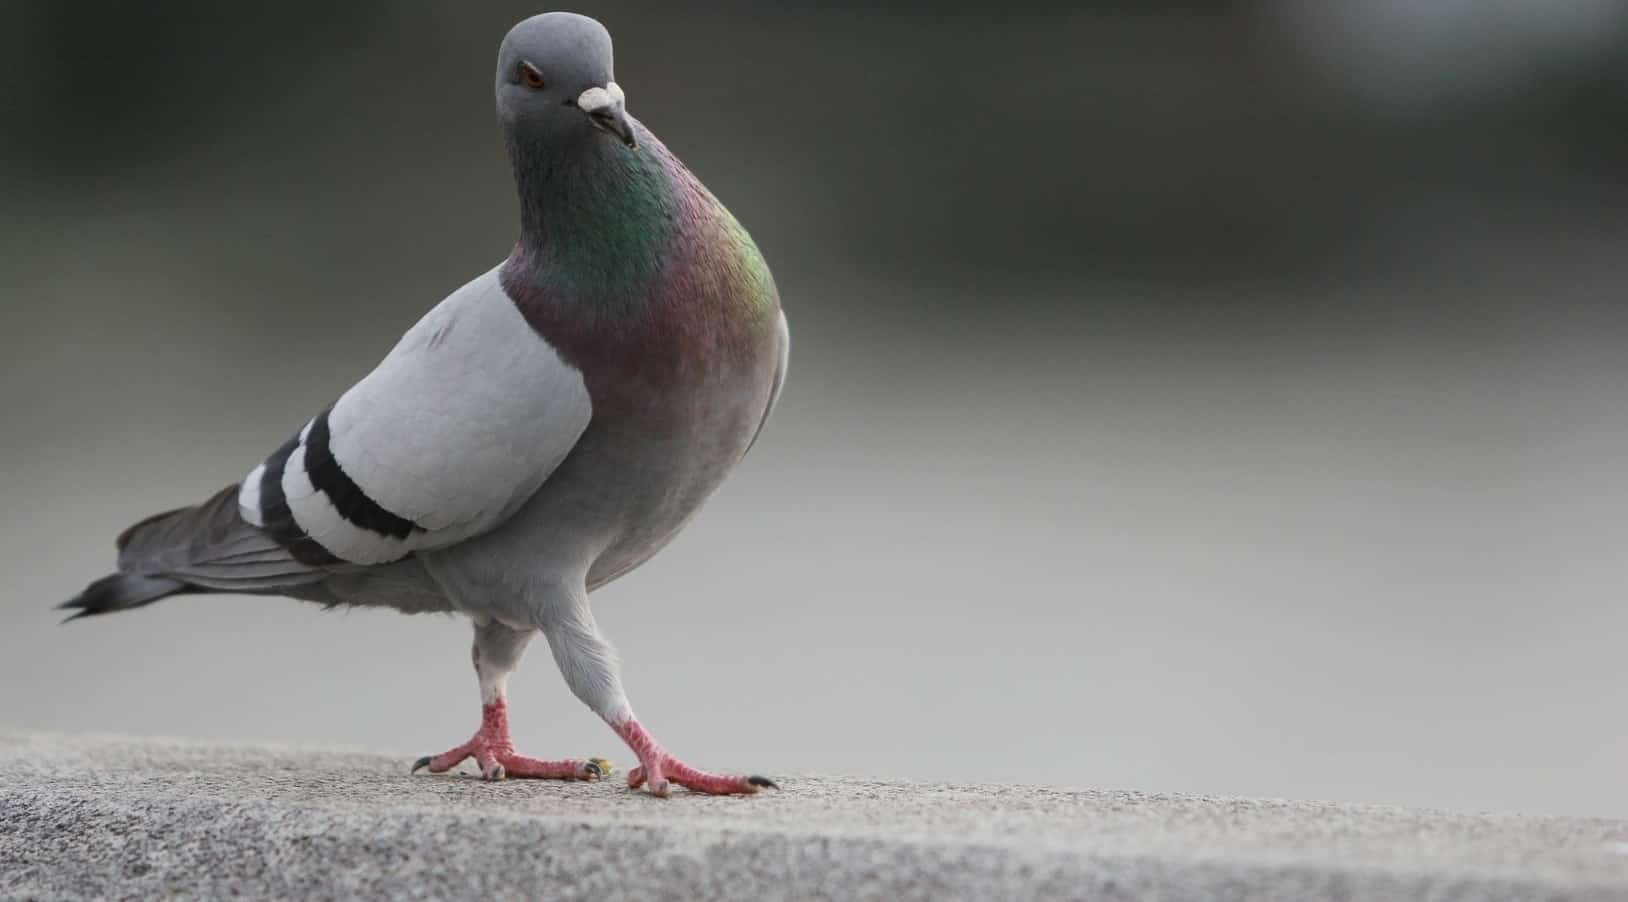 Pigeons – scariest animal